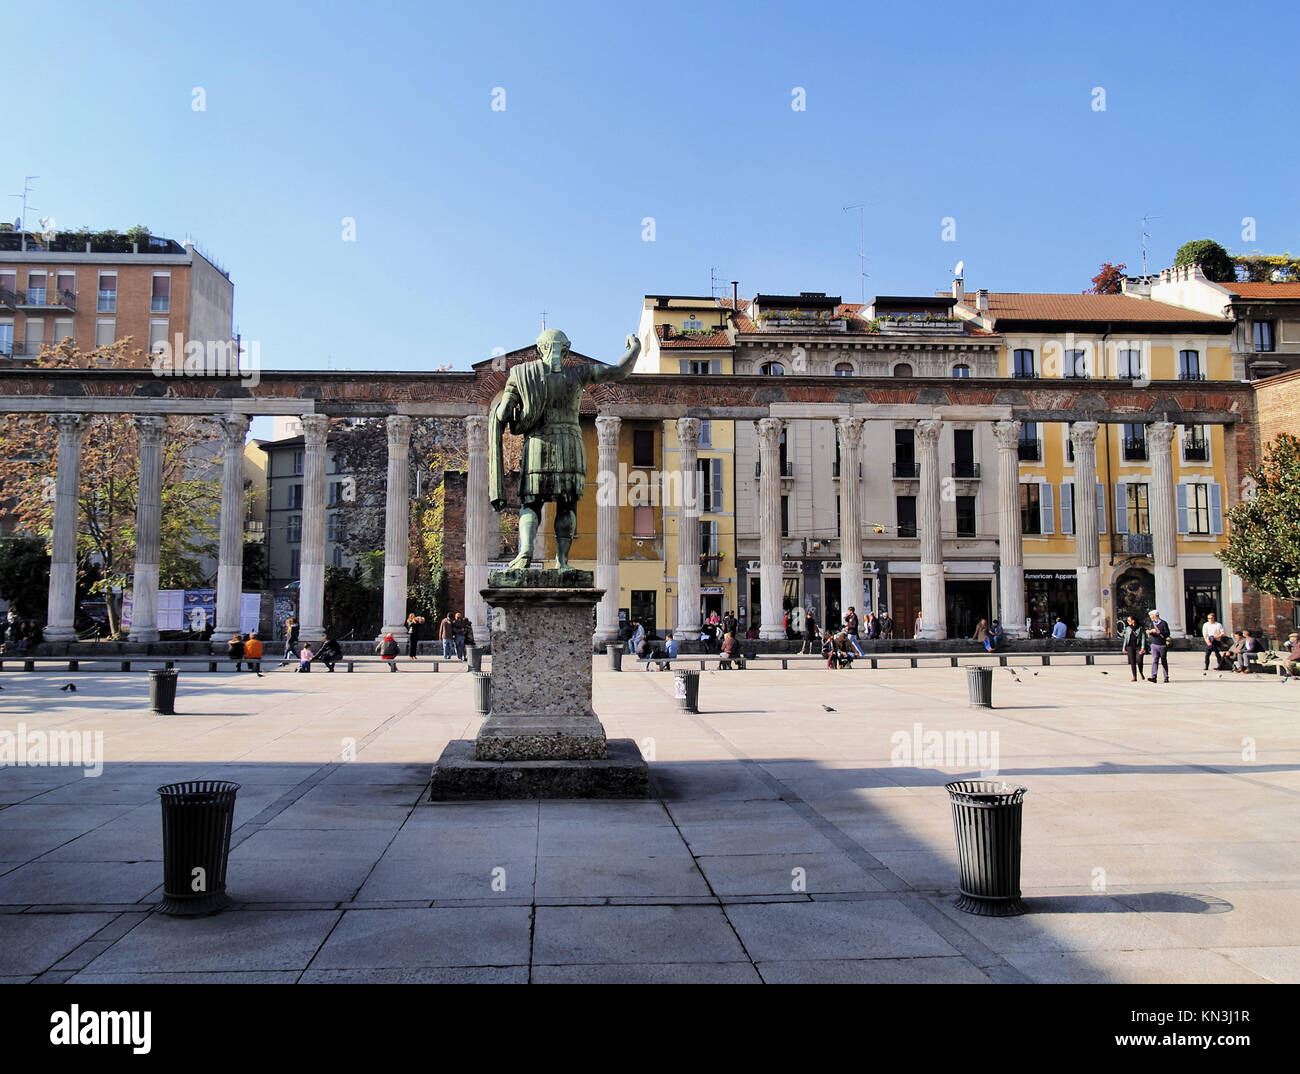 Colonne di San Lorenzo - famous ancient landmark in Milan, Lombardy, Italy. Stock Photo